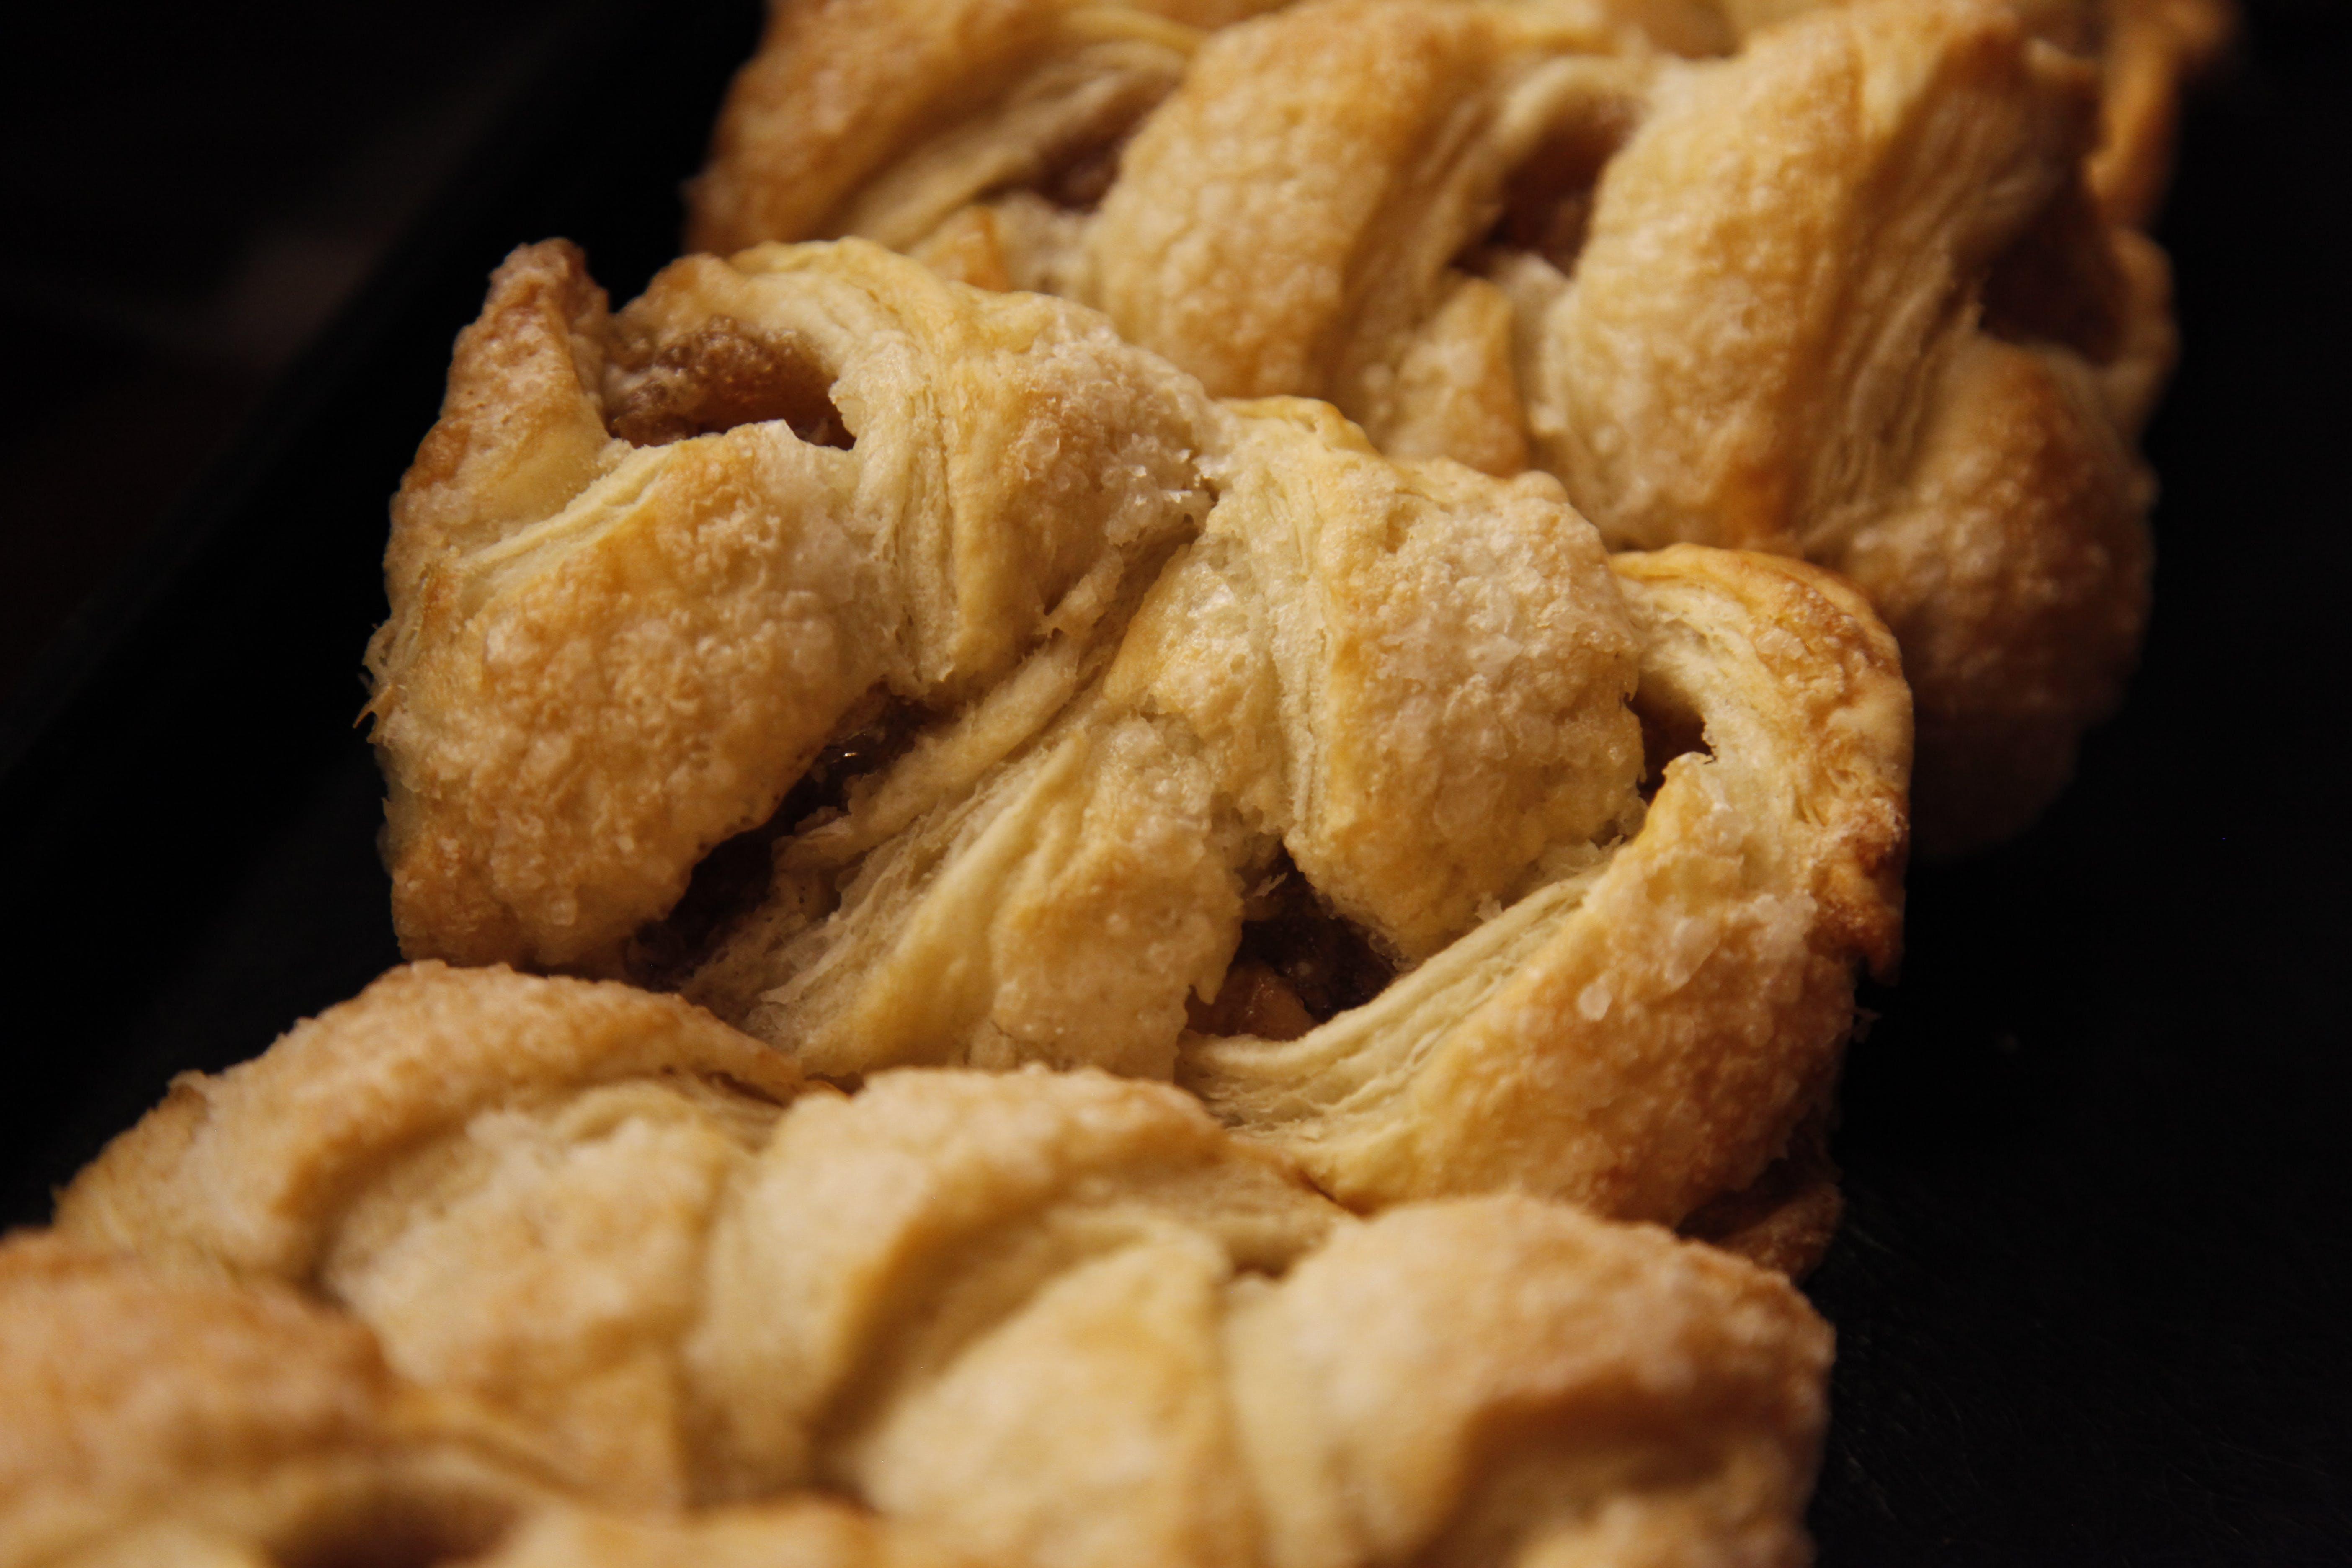 pastry, strudels